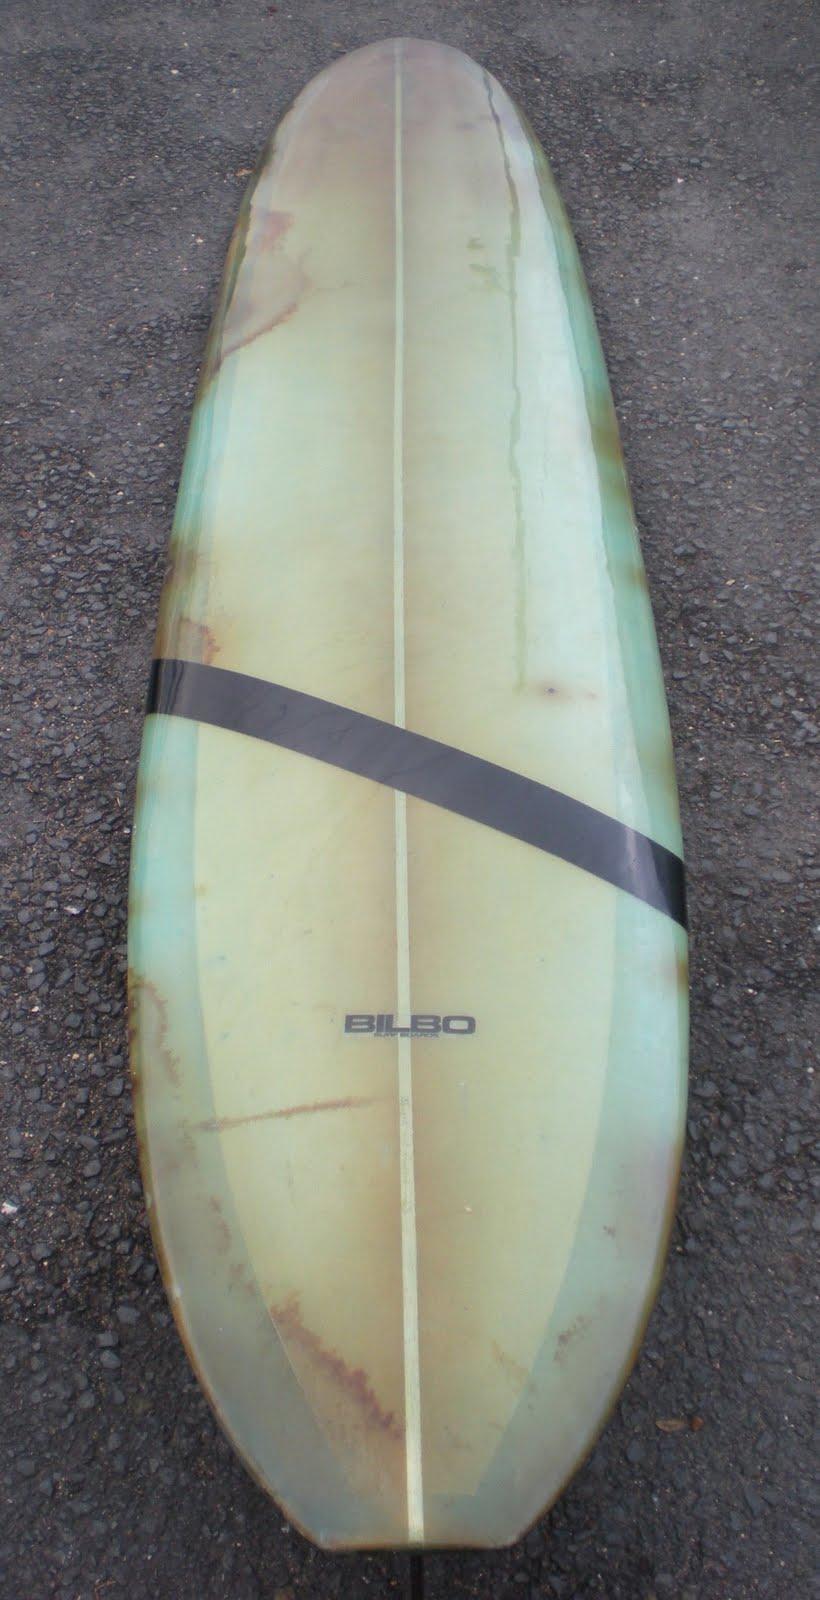 Vintage Surfboard Collector Uk Bilbo Longboard Made By